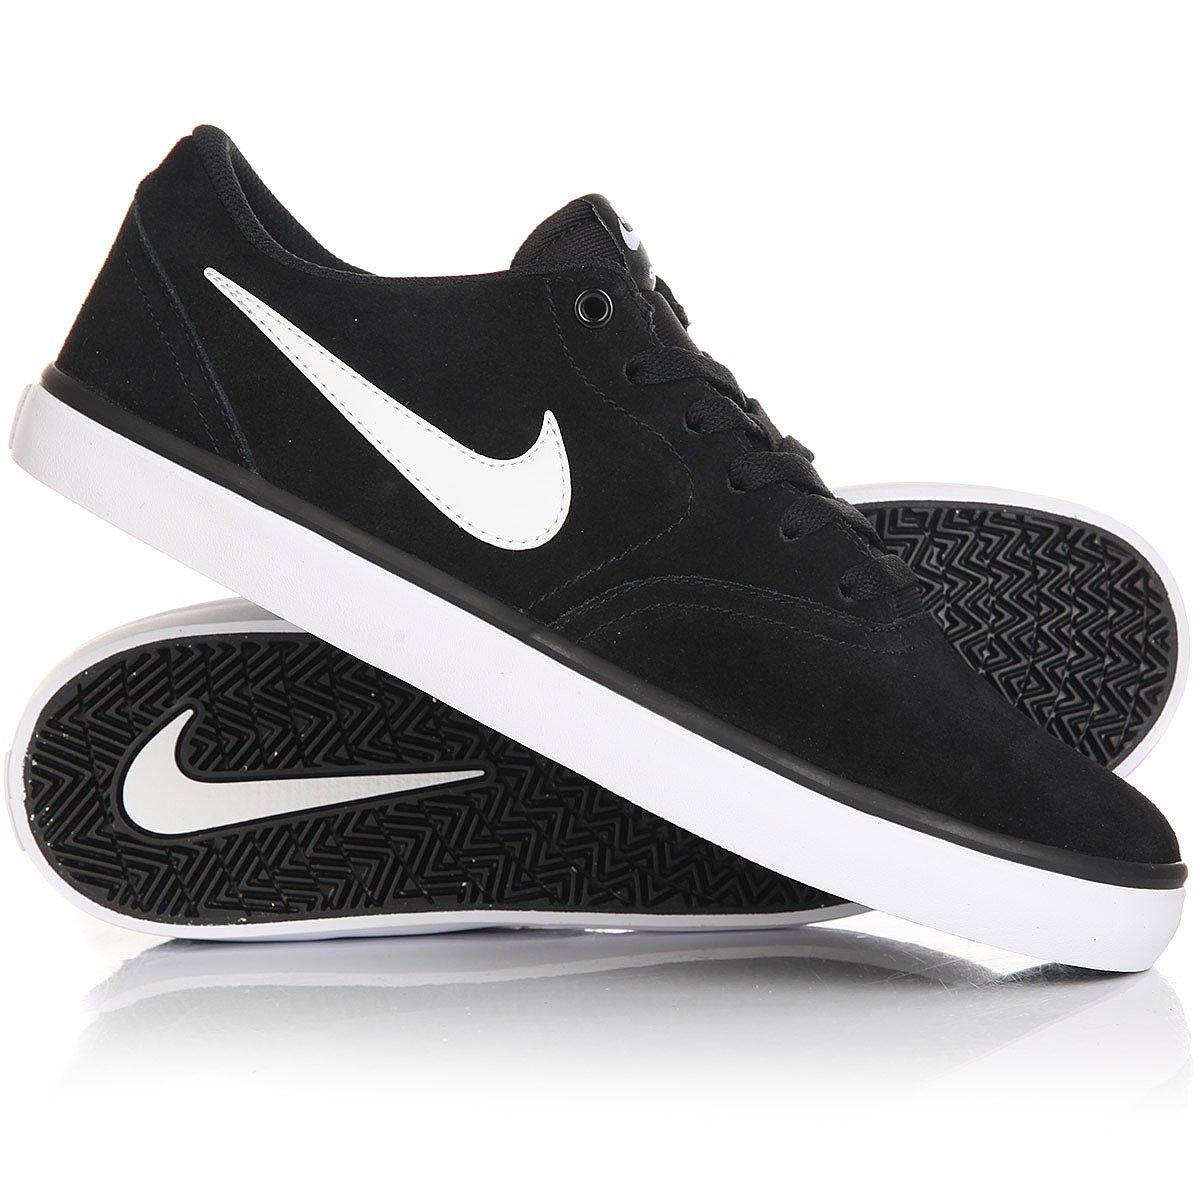 001 Herren 843895 Check Solar schwarz Nike Sneaker Skateschuh weiß SB 80PXwOnk